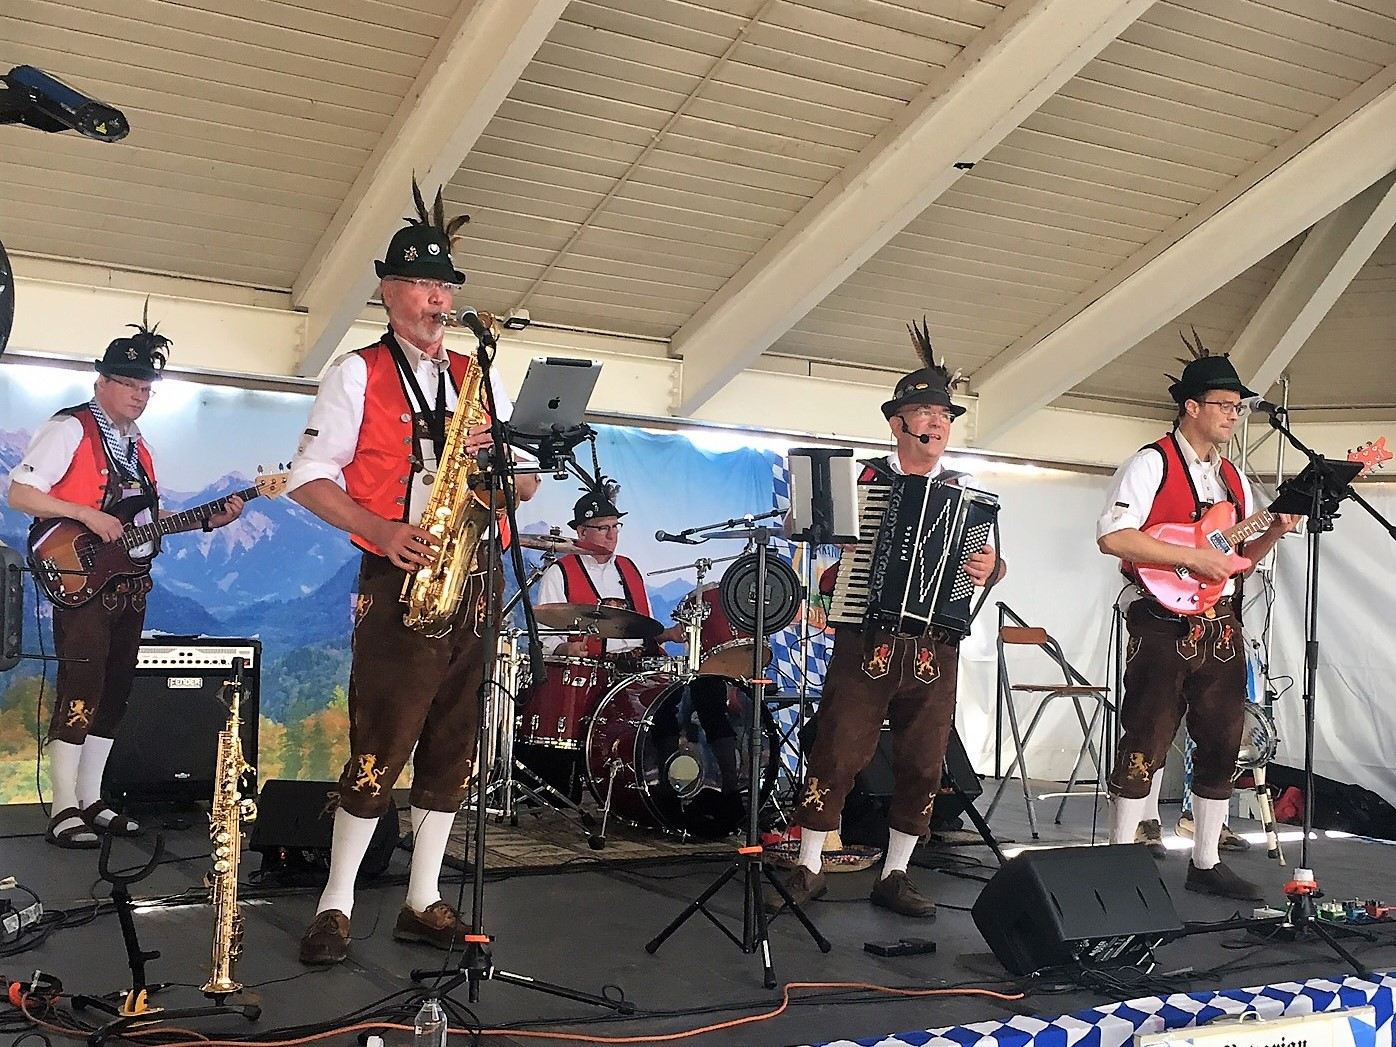 Bavarian Beer Garden Band